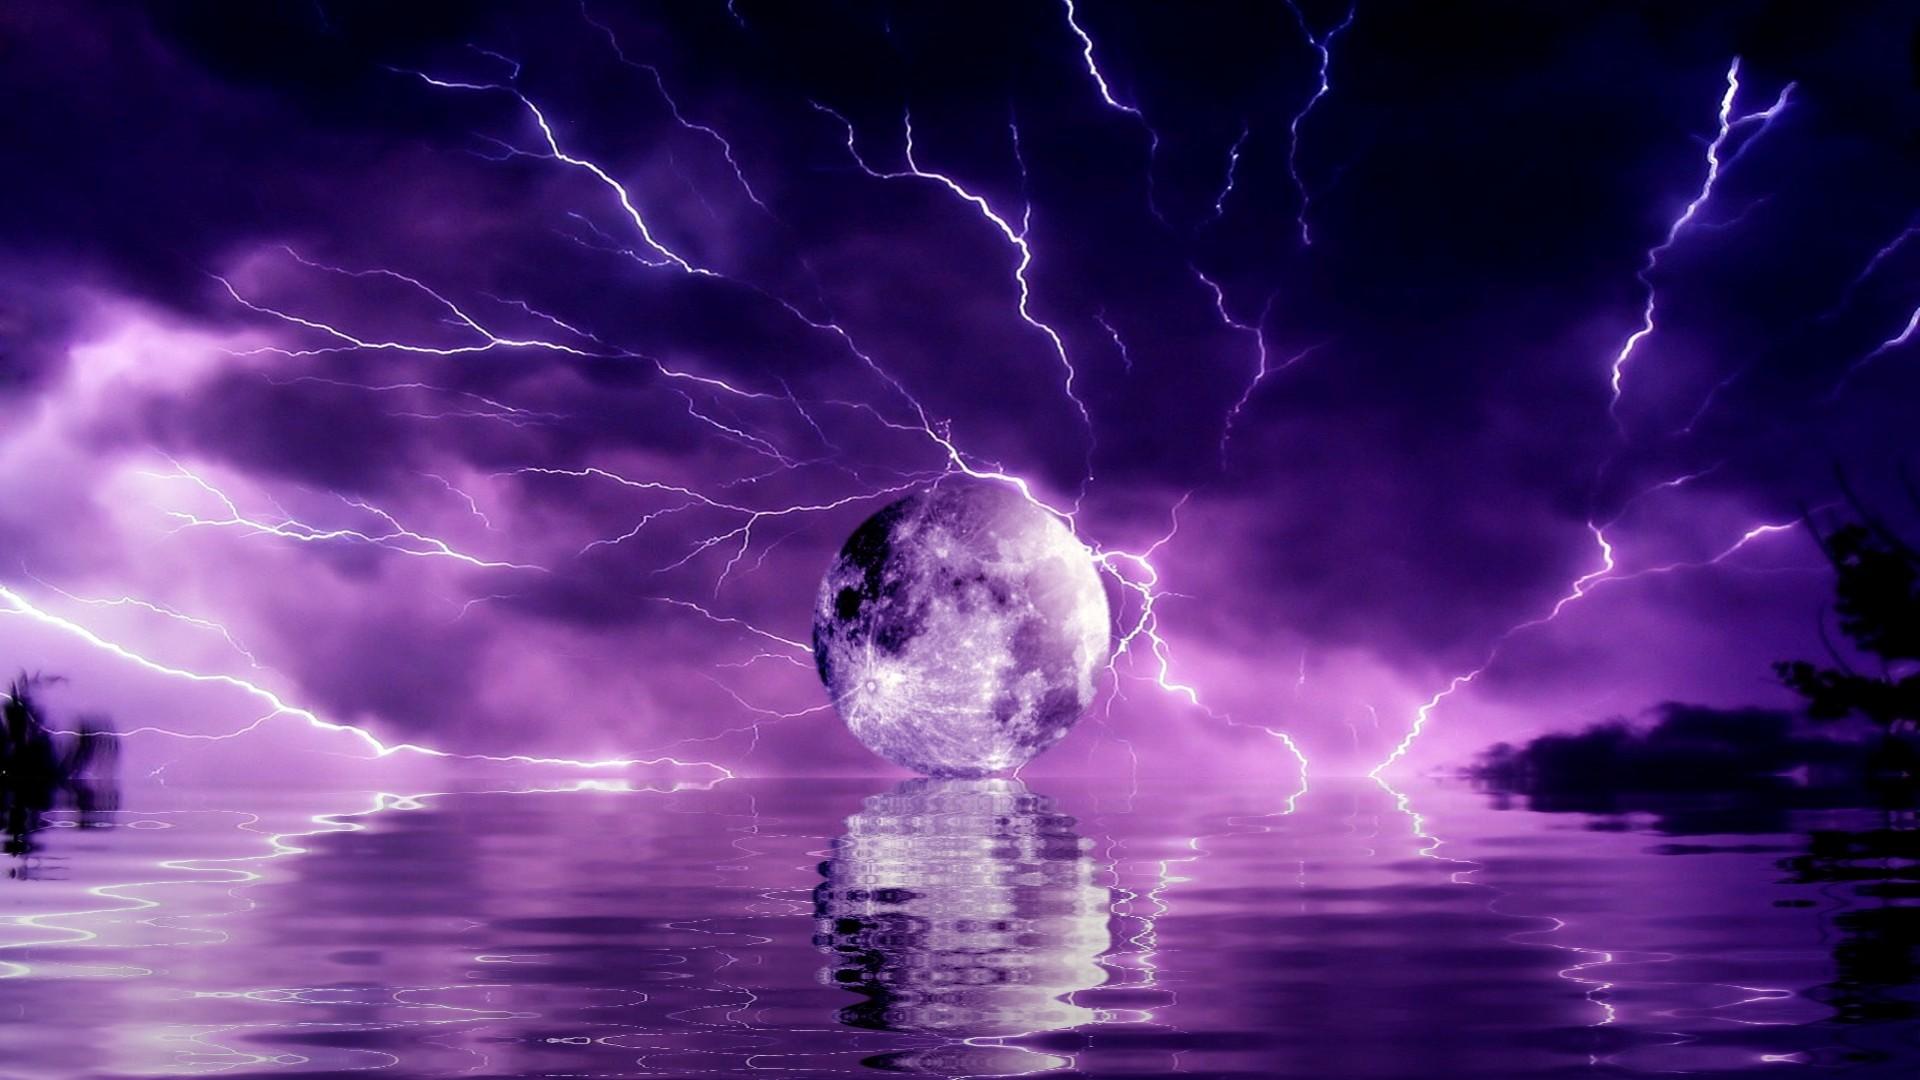 Purple Wallpapers 12 Best Wallpapers Collection Desktop: Thunderstorm Screensavers Wallpapers (64+ Images